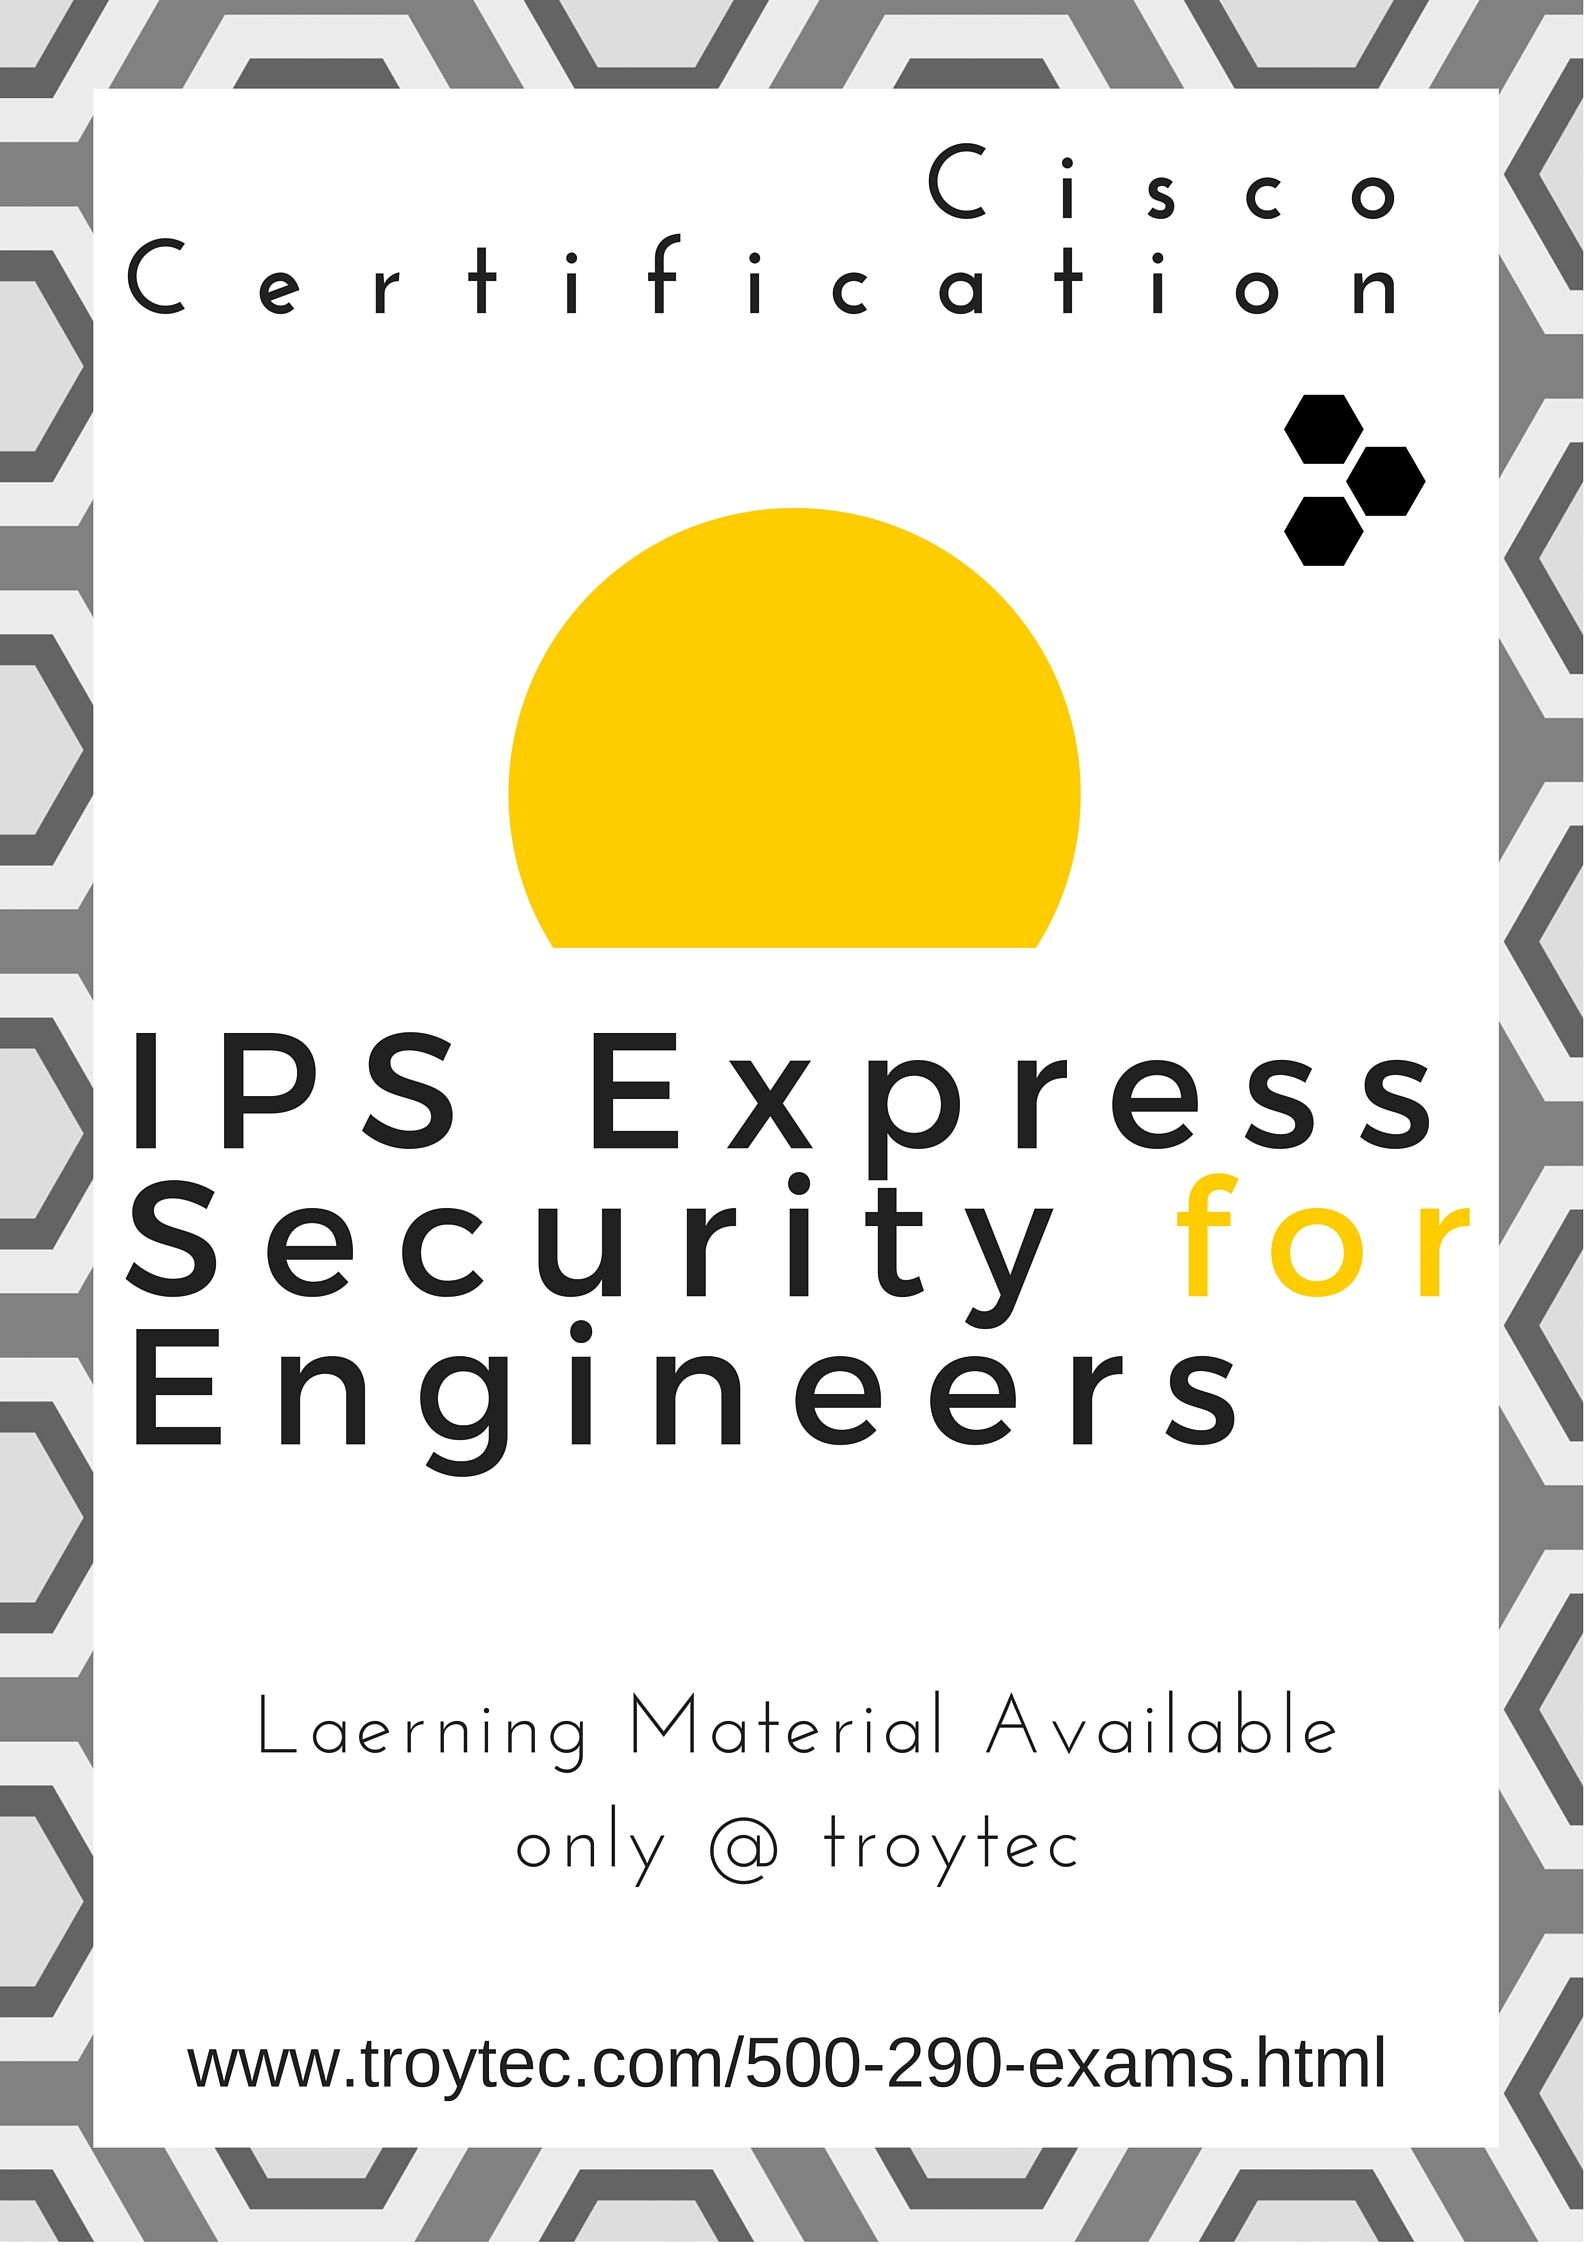 IPS Express Security for Engineers Exam Code 500_290